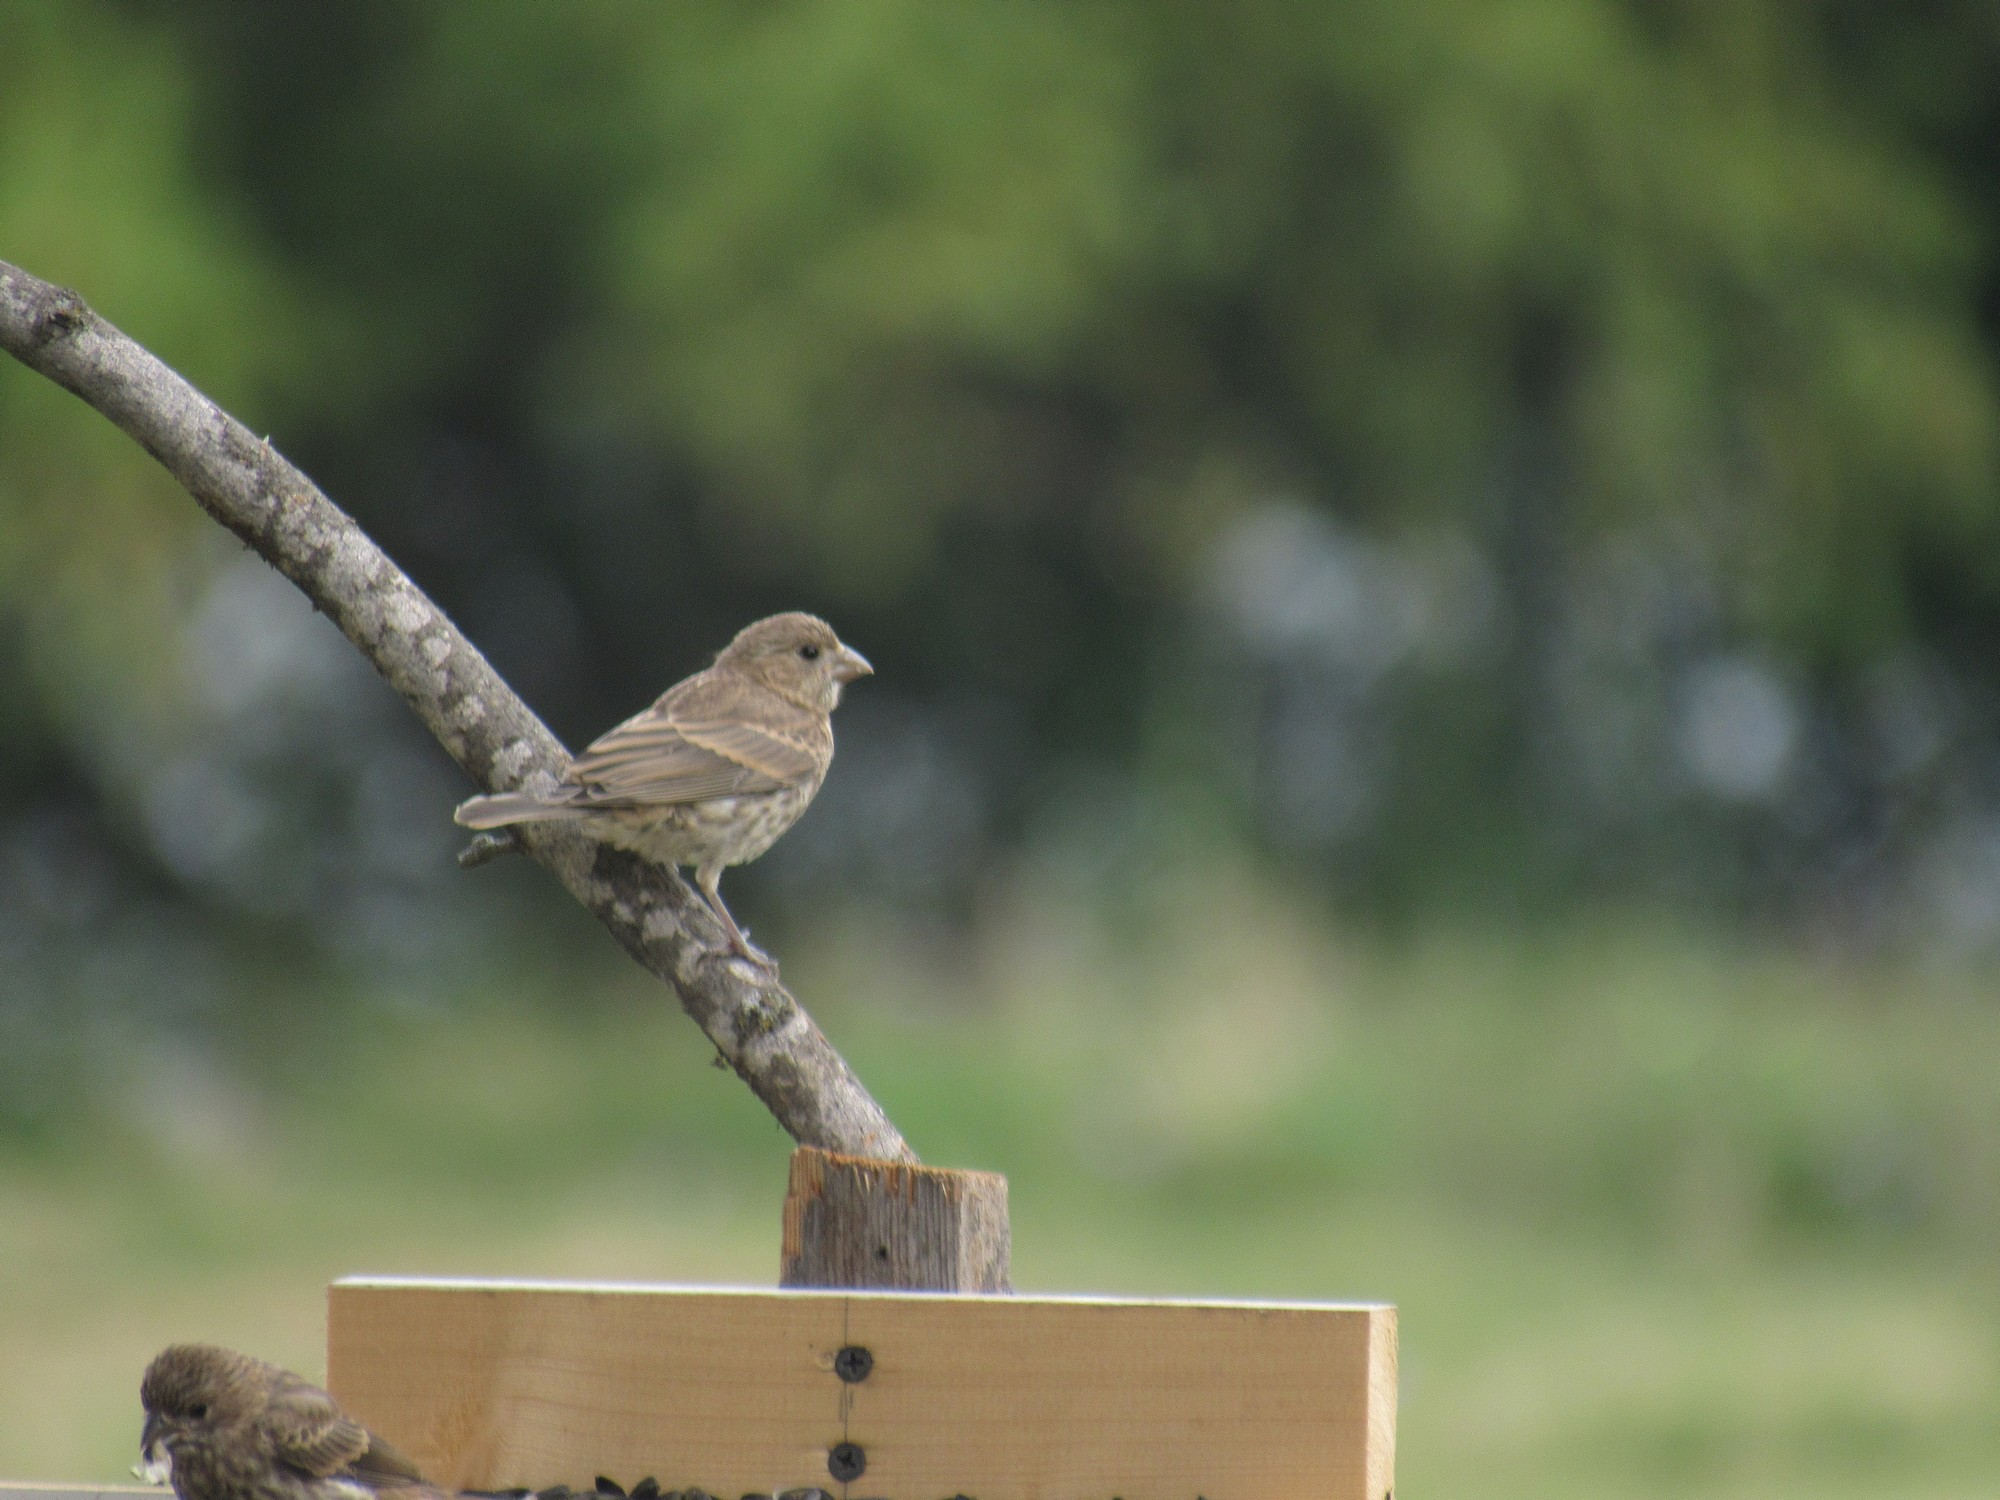 bird on feeder perch.jpg